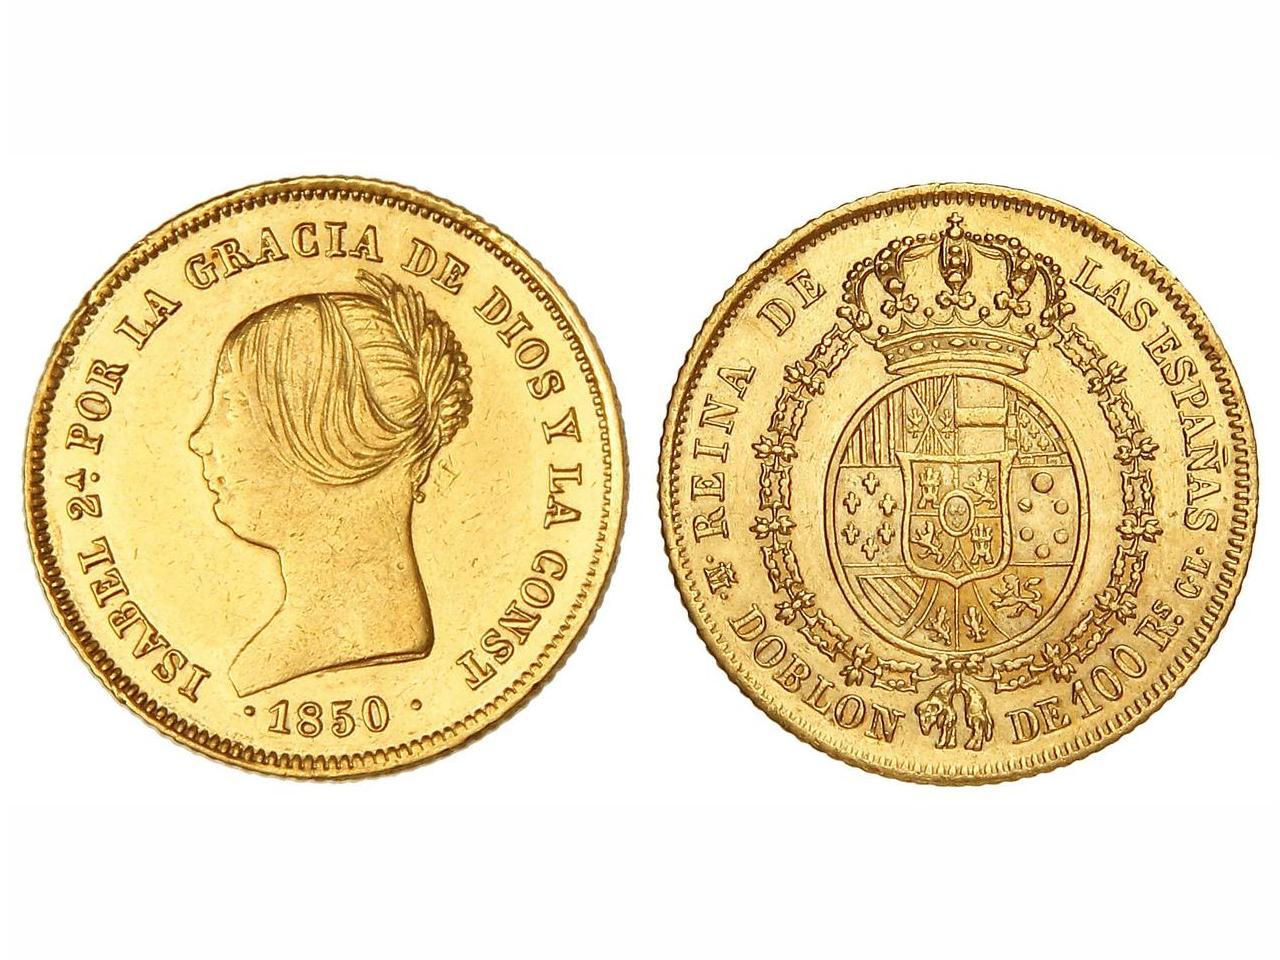 Doblón de 100 reales 1850. Isabel II. Madrid. CL X6lpww